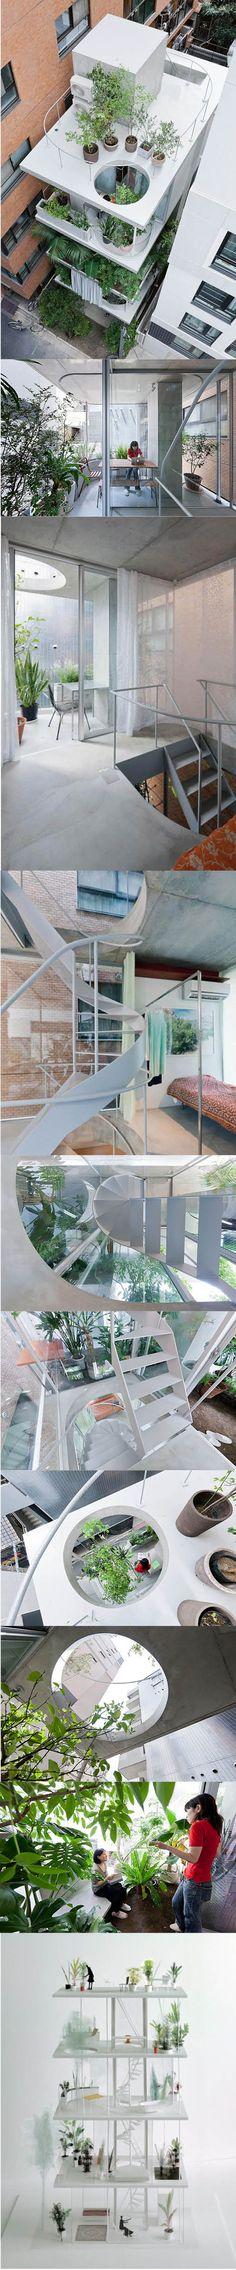 2011 Nishizawa - House and Garden / Tokyo Japan / white concrete glass / minimalism / photographs: Iwan Baan